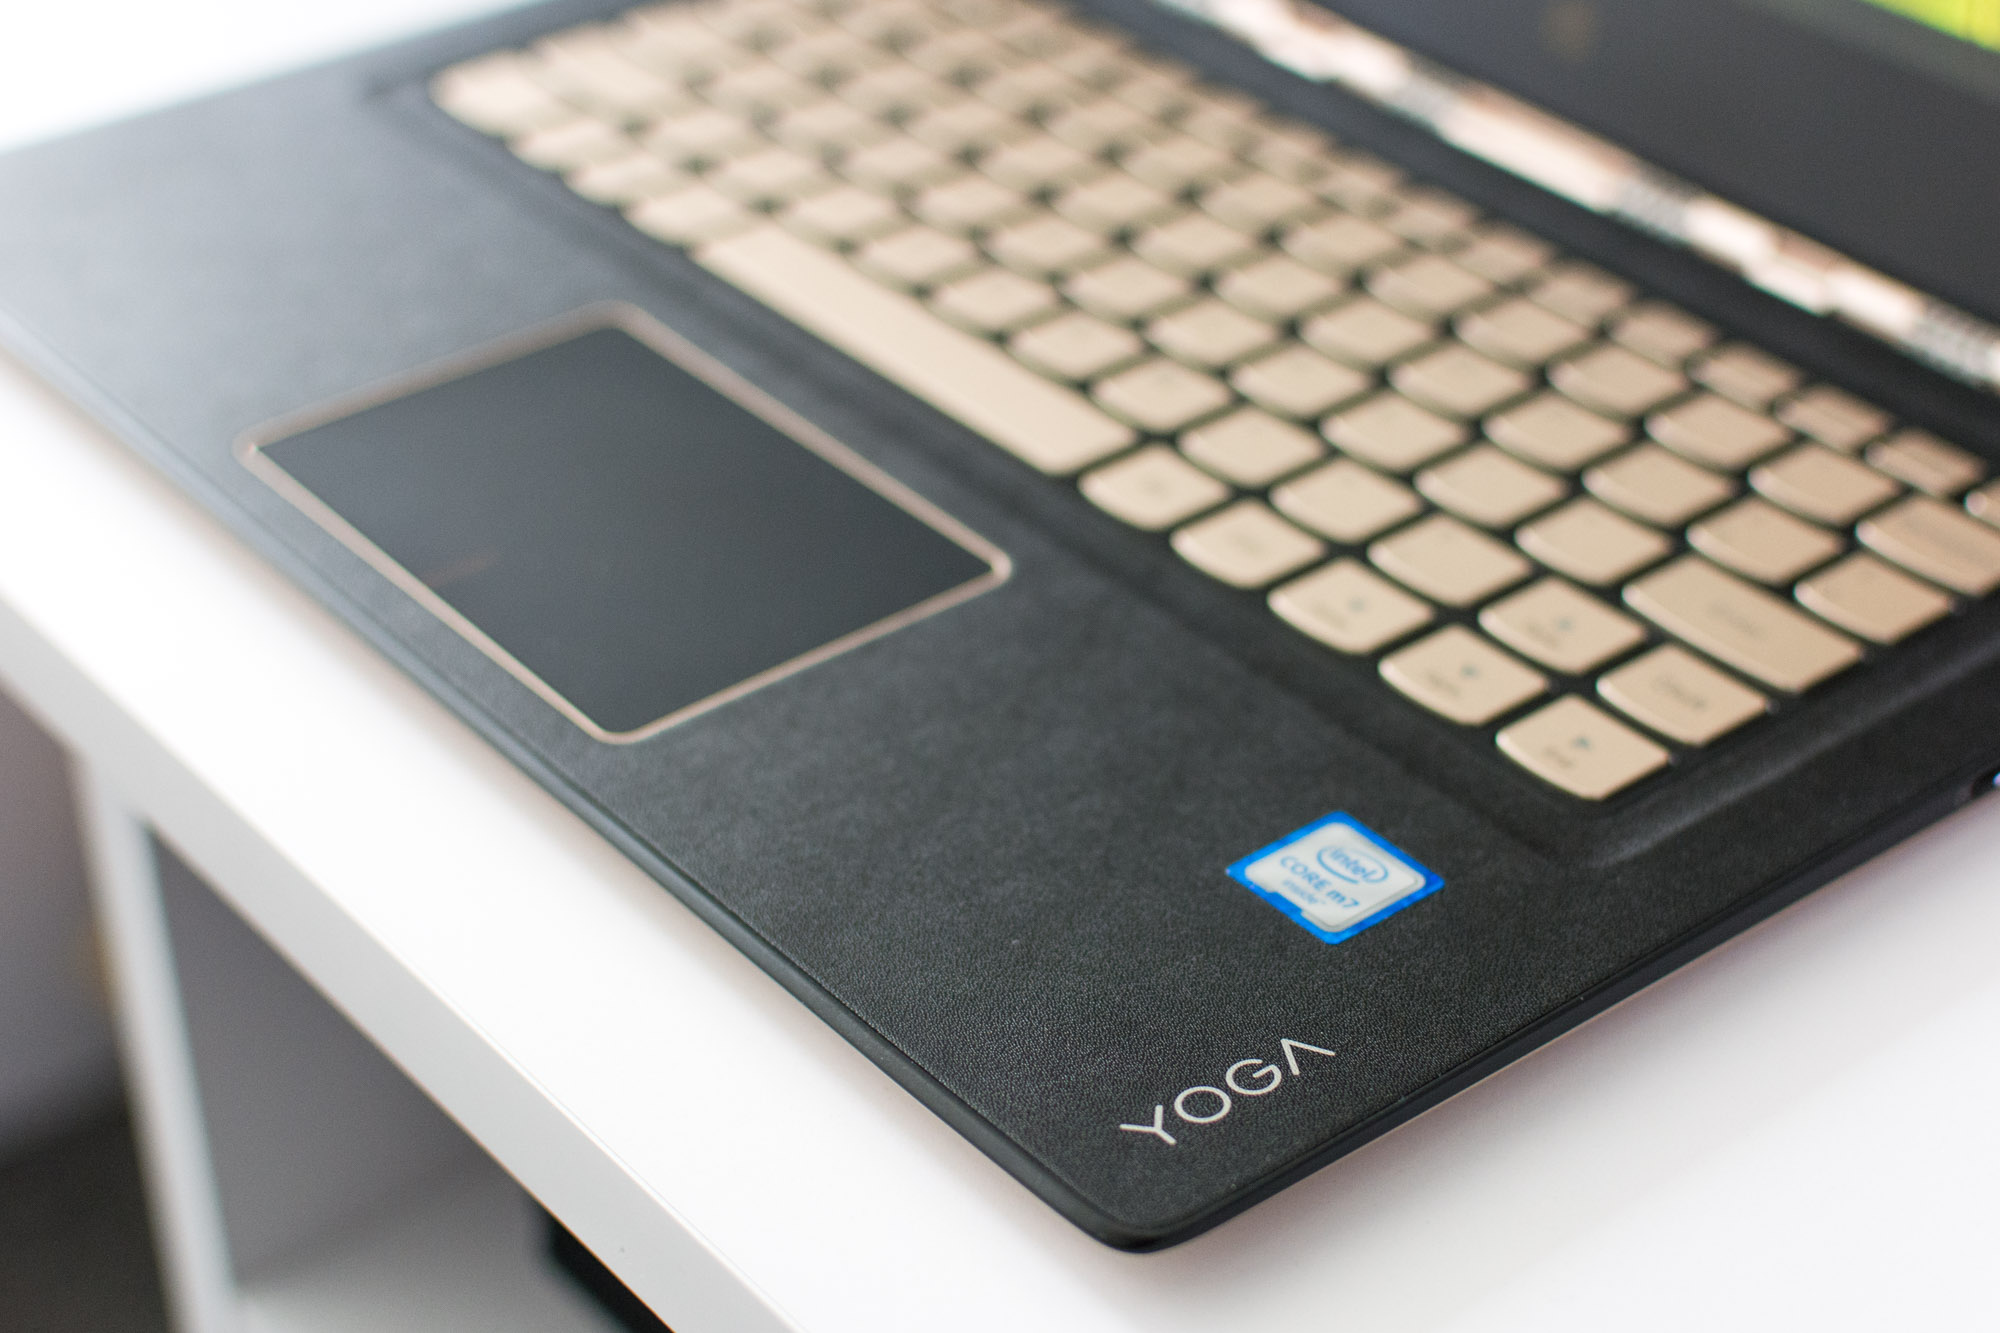 Lenovo-Yoga-900s-2